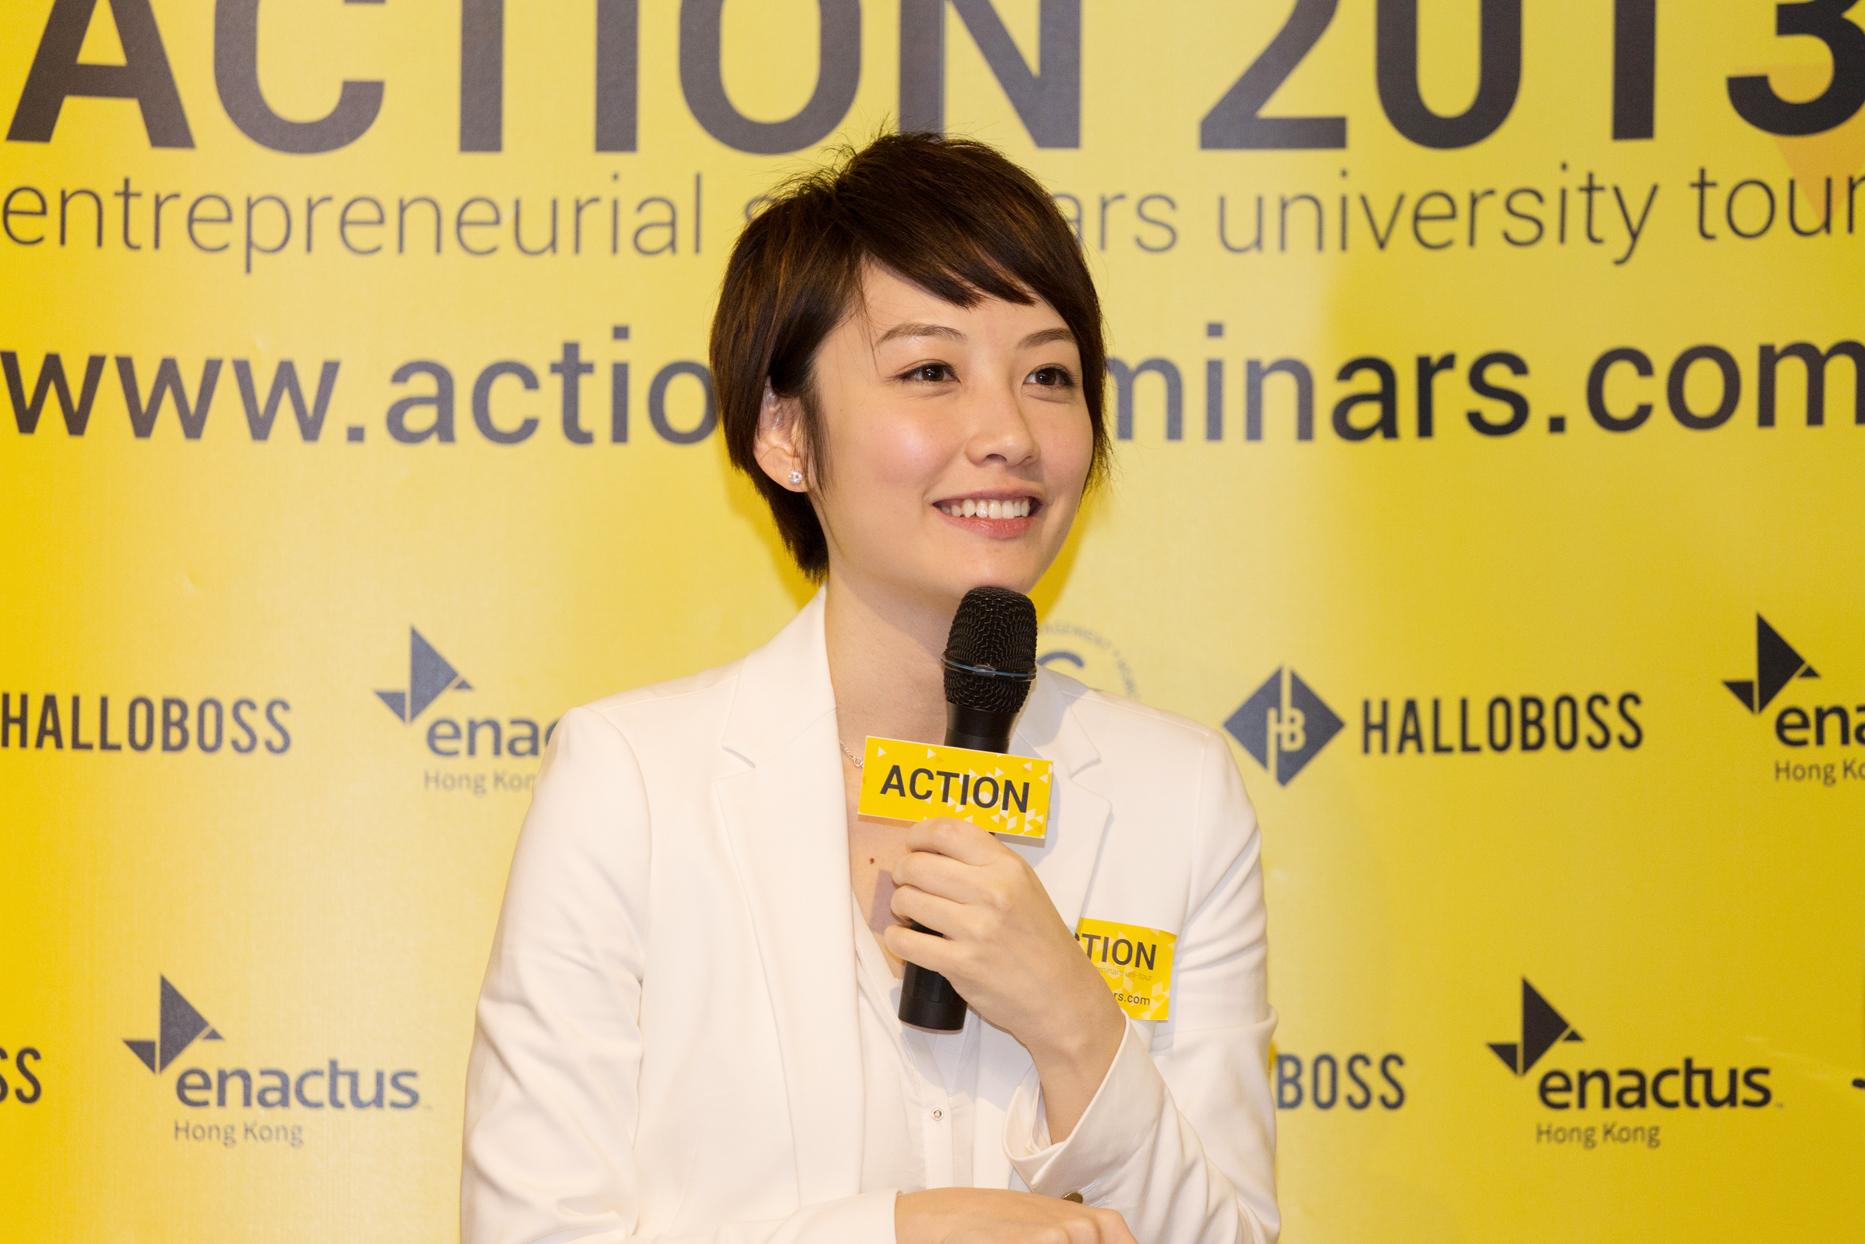 Action2013_HalloBoss_CrystalJam_Bobo